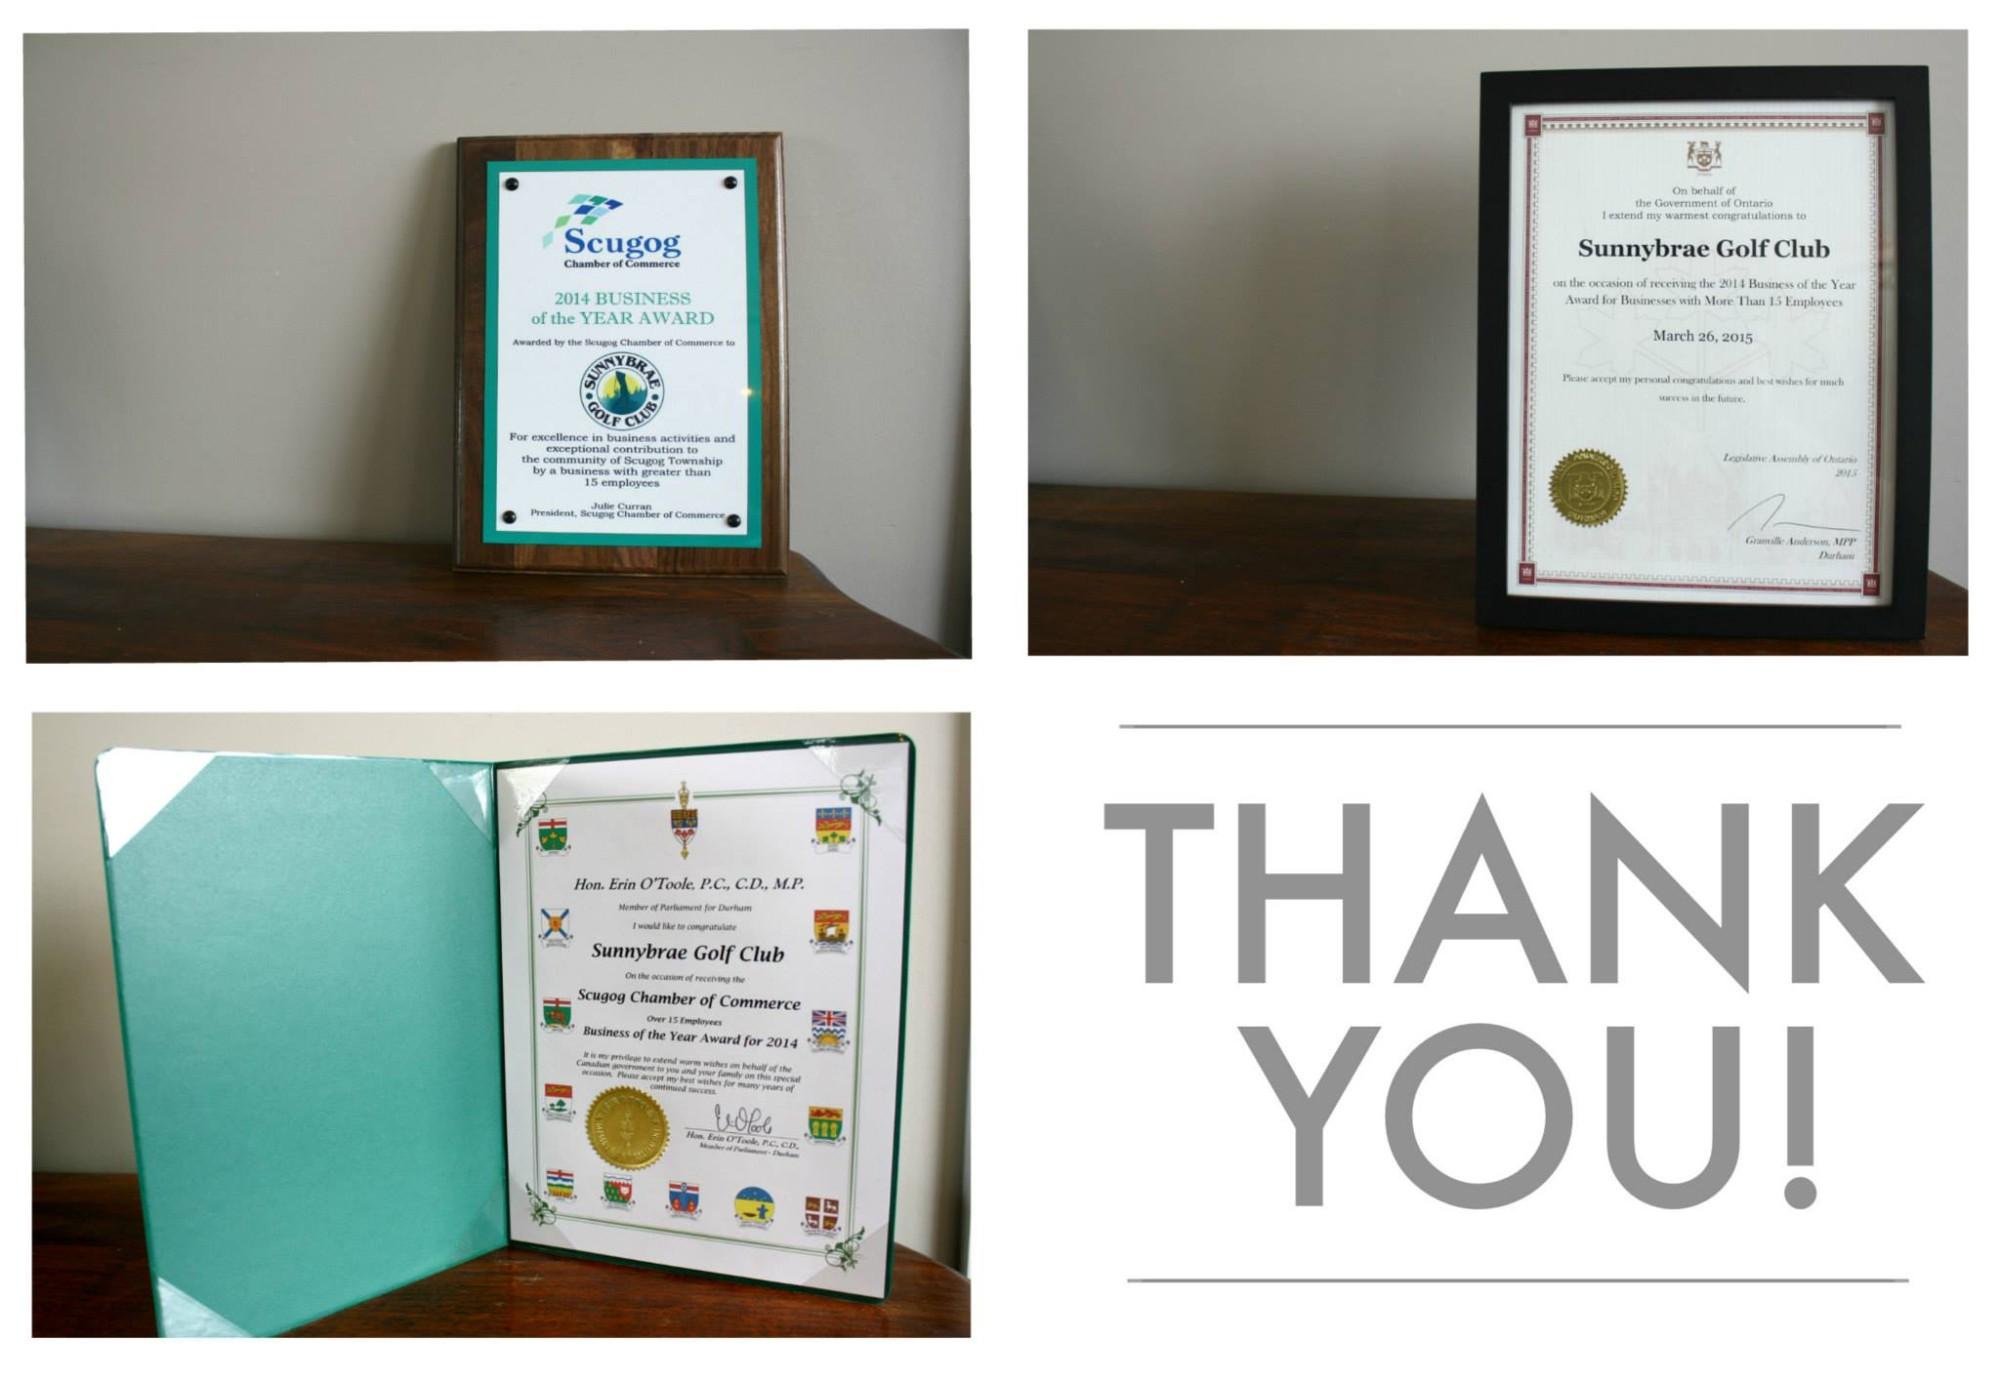 scugog chamber of commerce best business award 2014 2015 Sunnybrae Golf Club